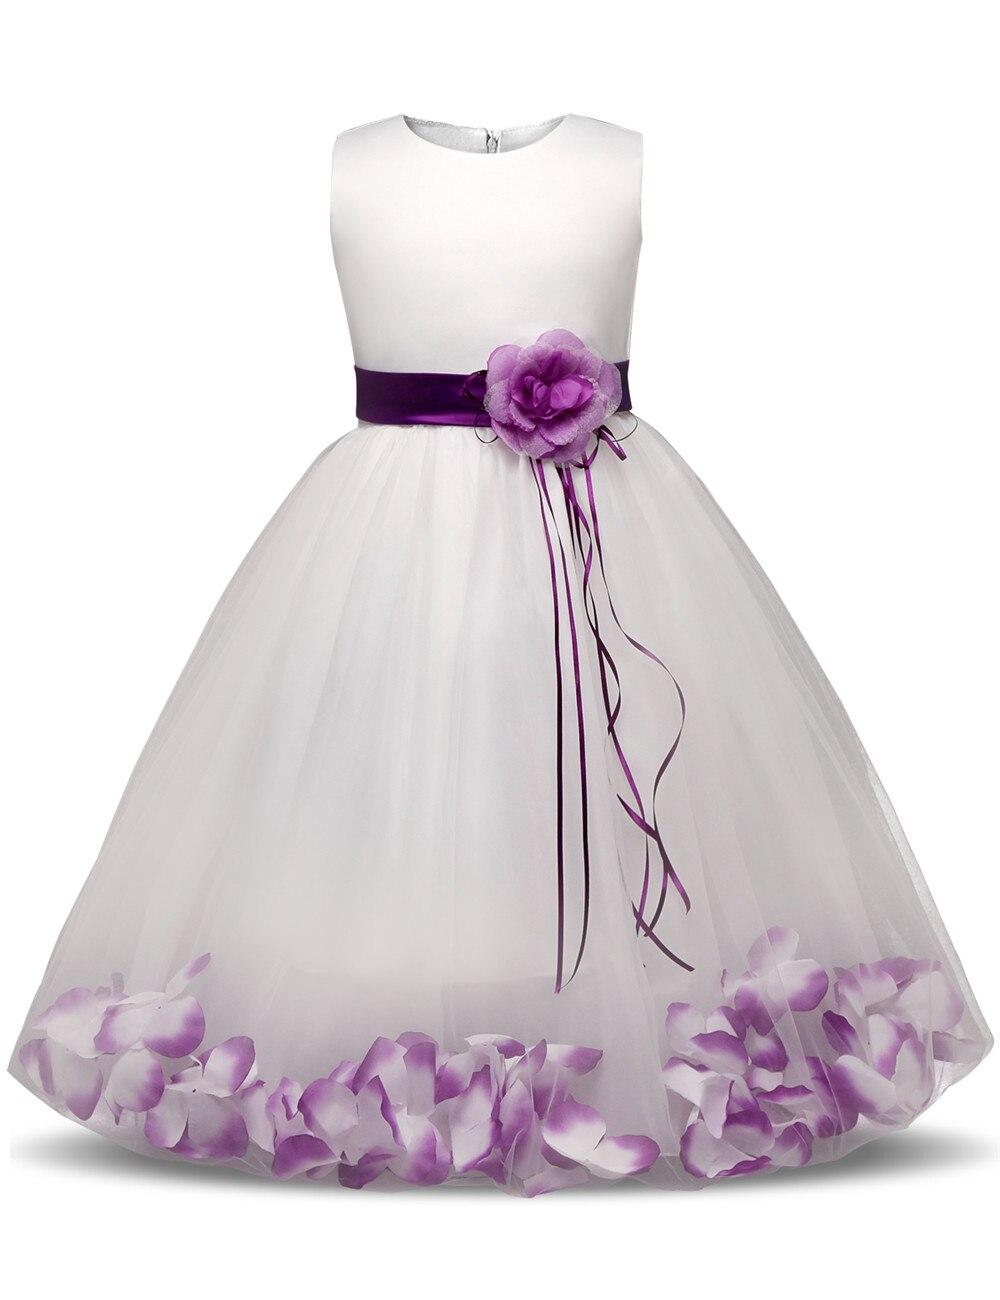 8dcedf0de1 Flower Girl Baby Wedding Dress Children s Clothing Girl Party Costume Evening  Formal Dress Kids Clothes Fancy